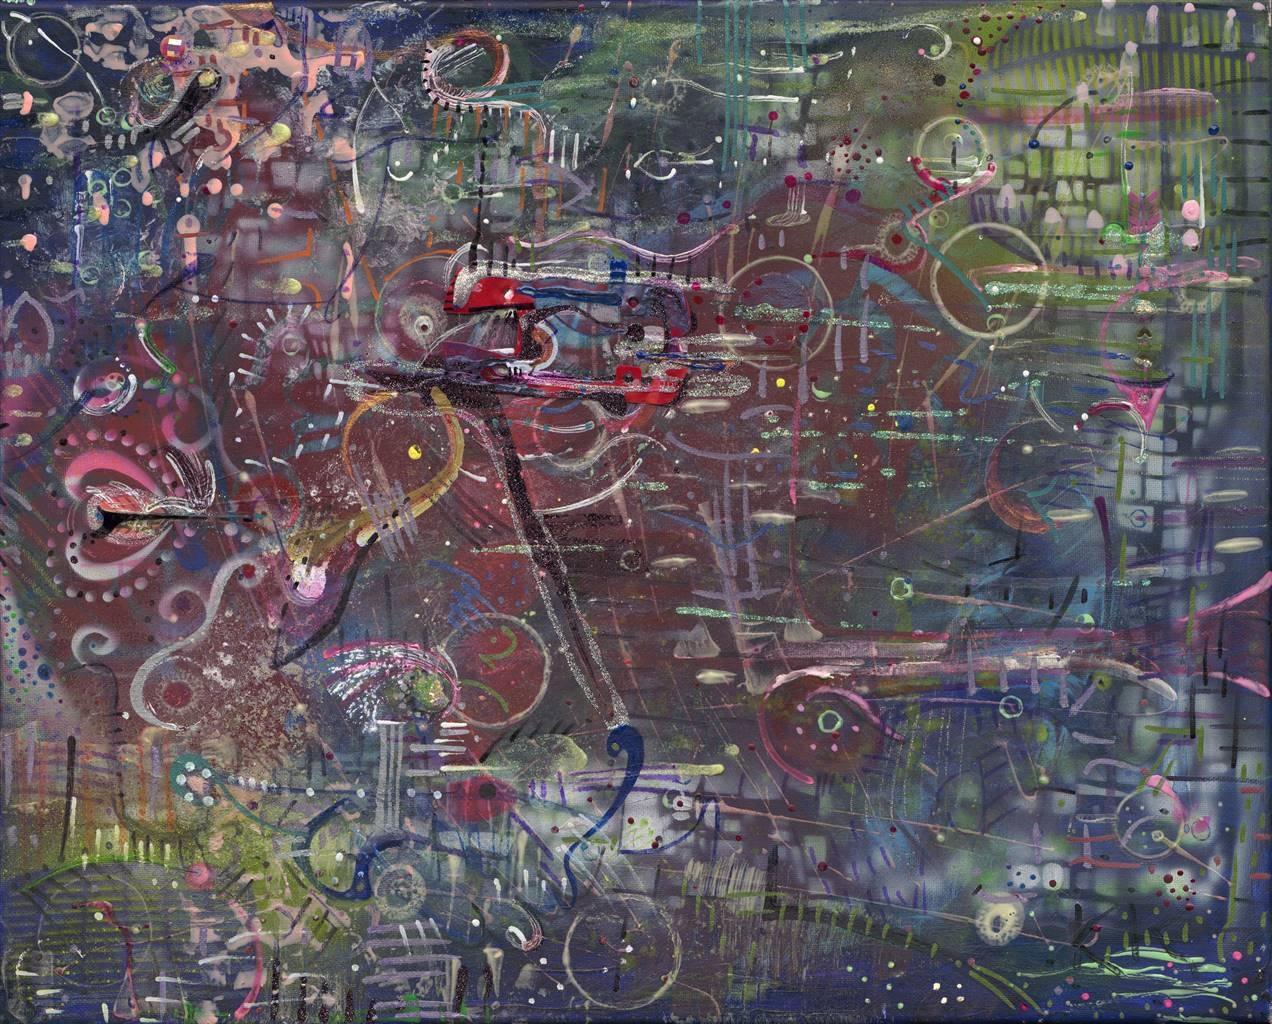 Denel-KK, Vector Collaboration, Mixed Media on Canvas, 16 x 20 image